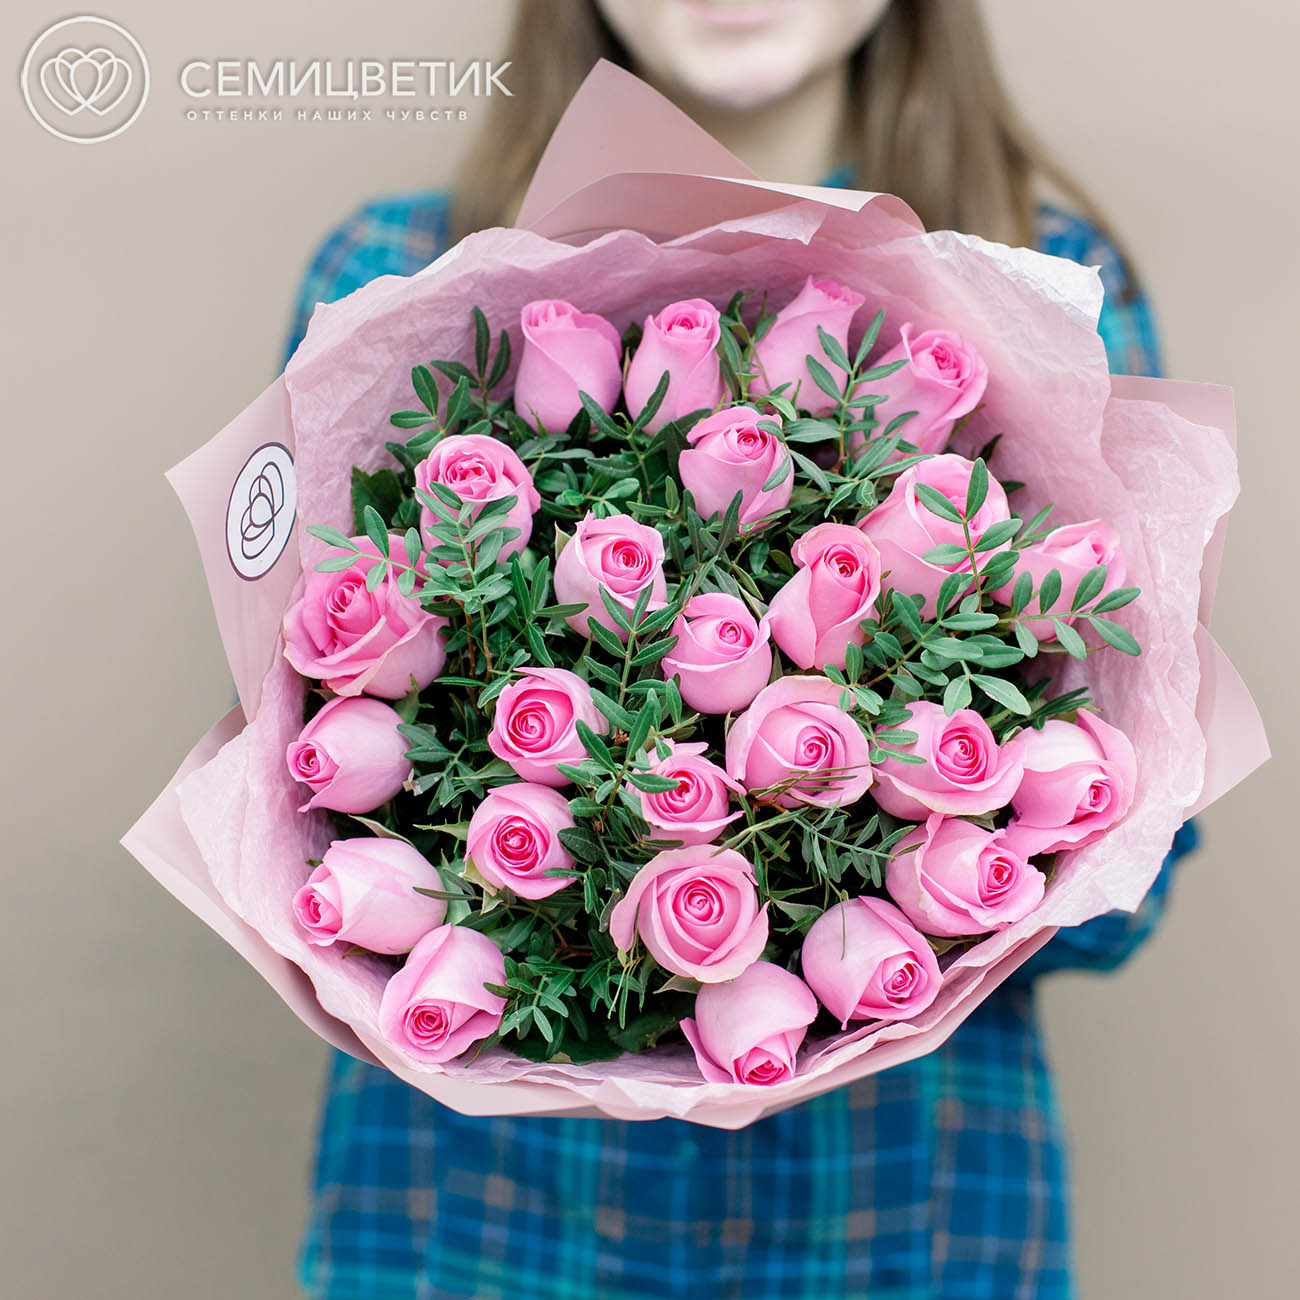 25 розовых роз Premium 40 см с фисташкой фото